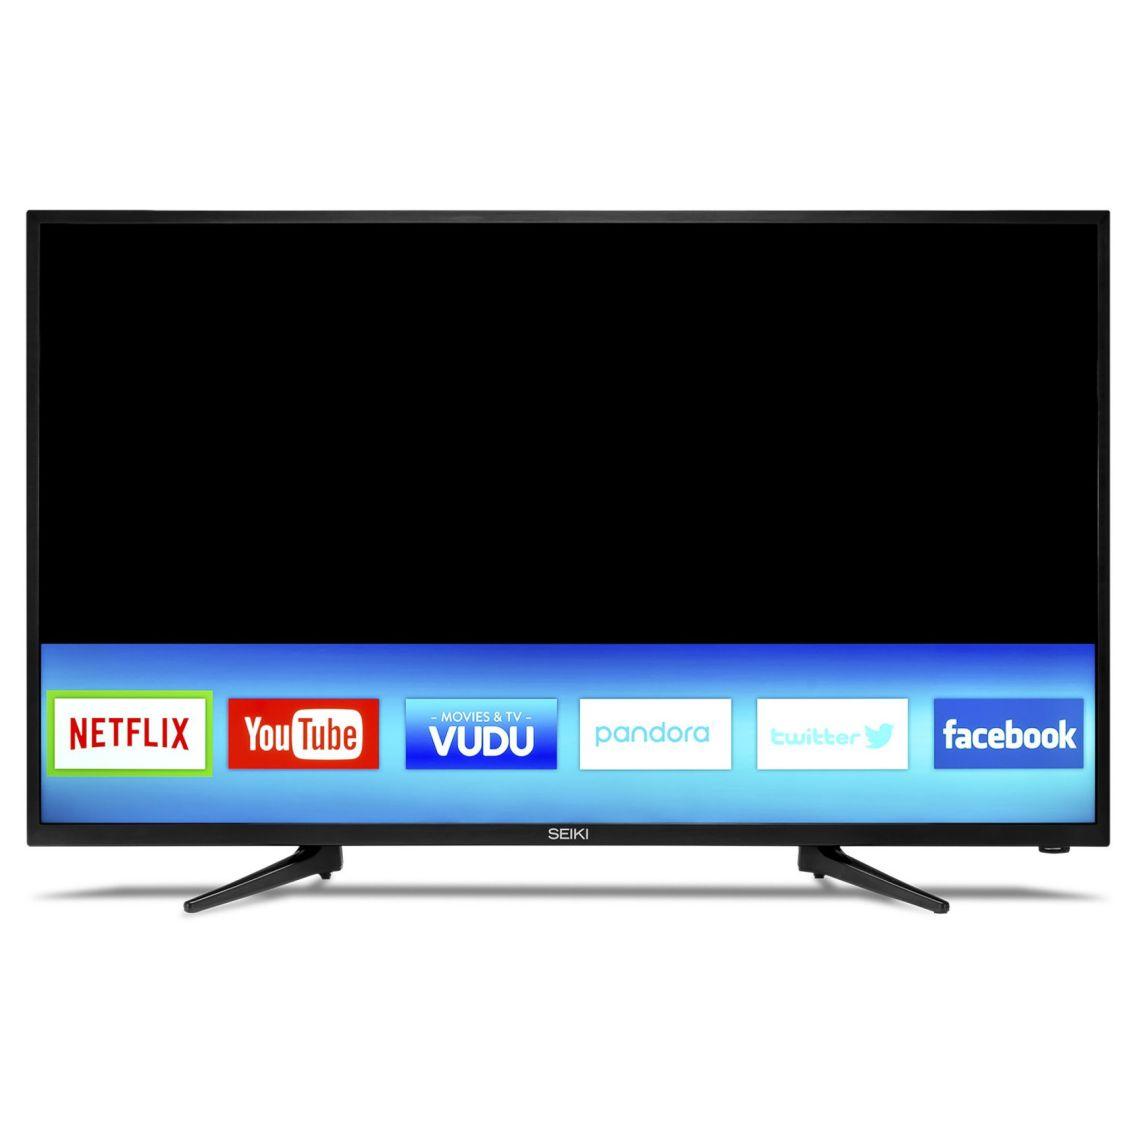 "Seiki 49"" Class 4K (2160p) Smart LED HDTV (SC-49UK700N) - Walmart.com"